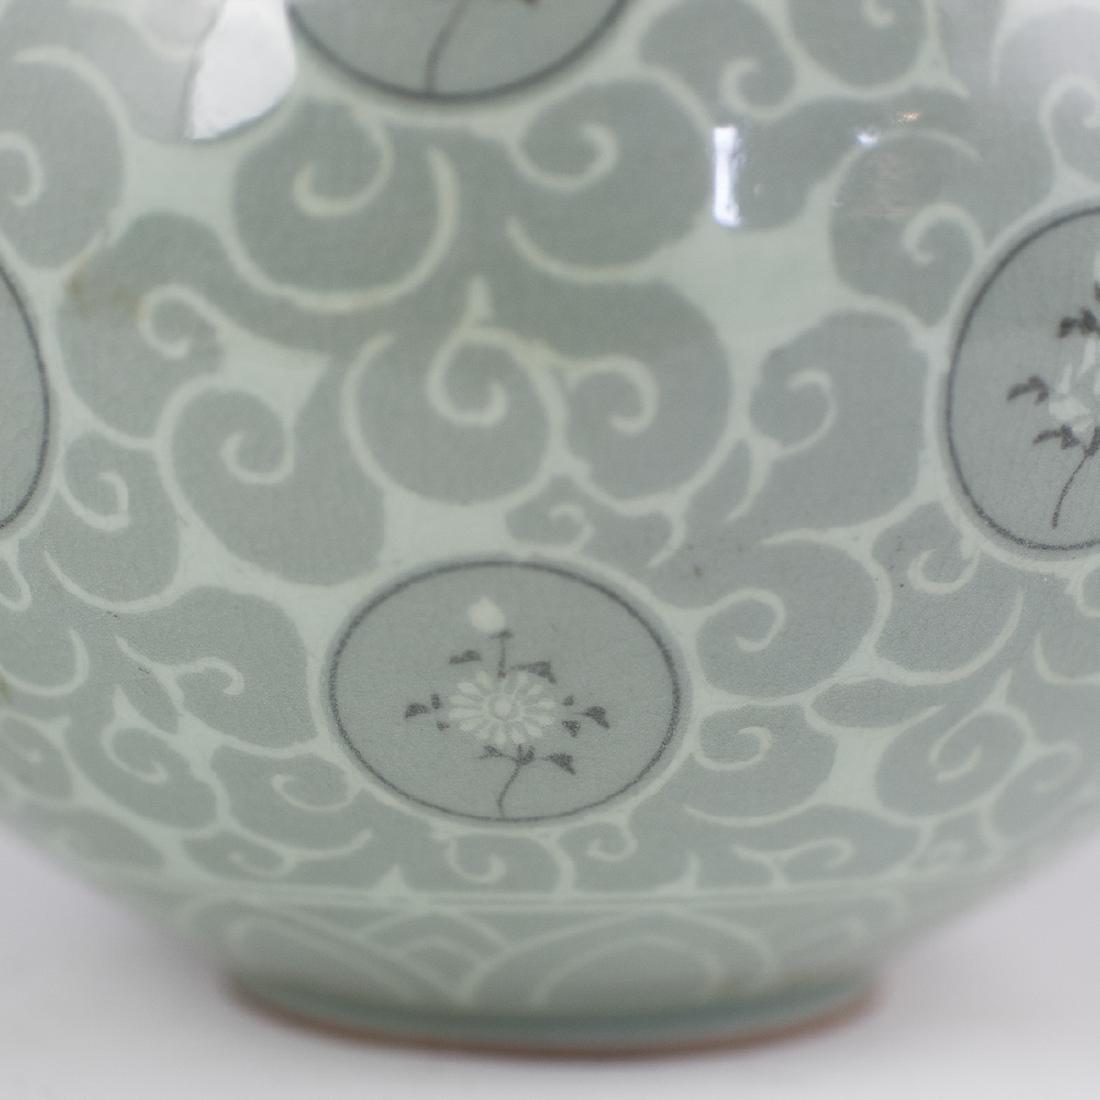 Korean Celadon Porcelain Vase - 2